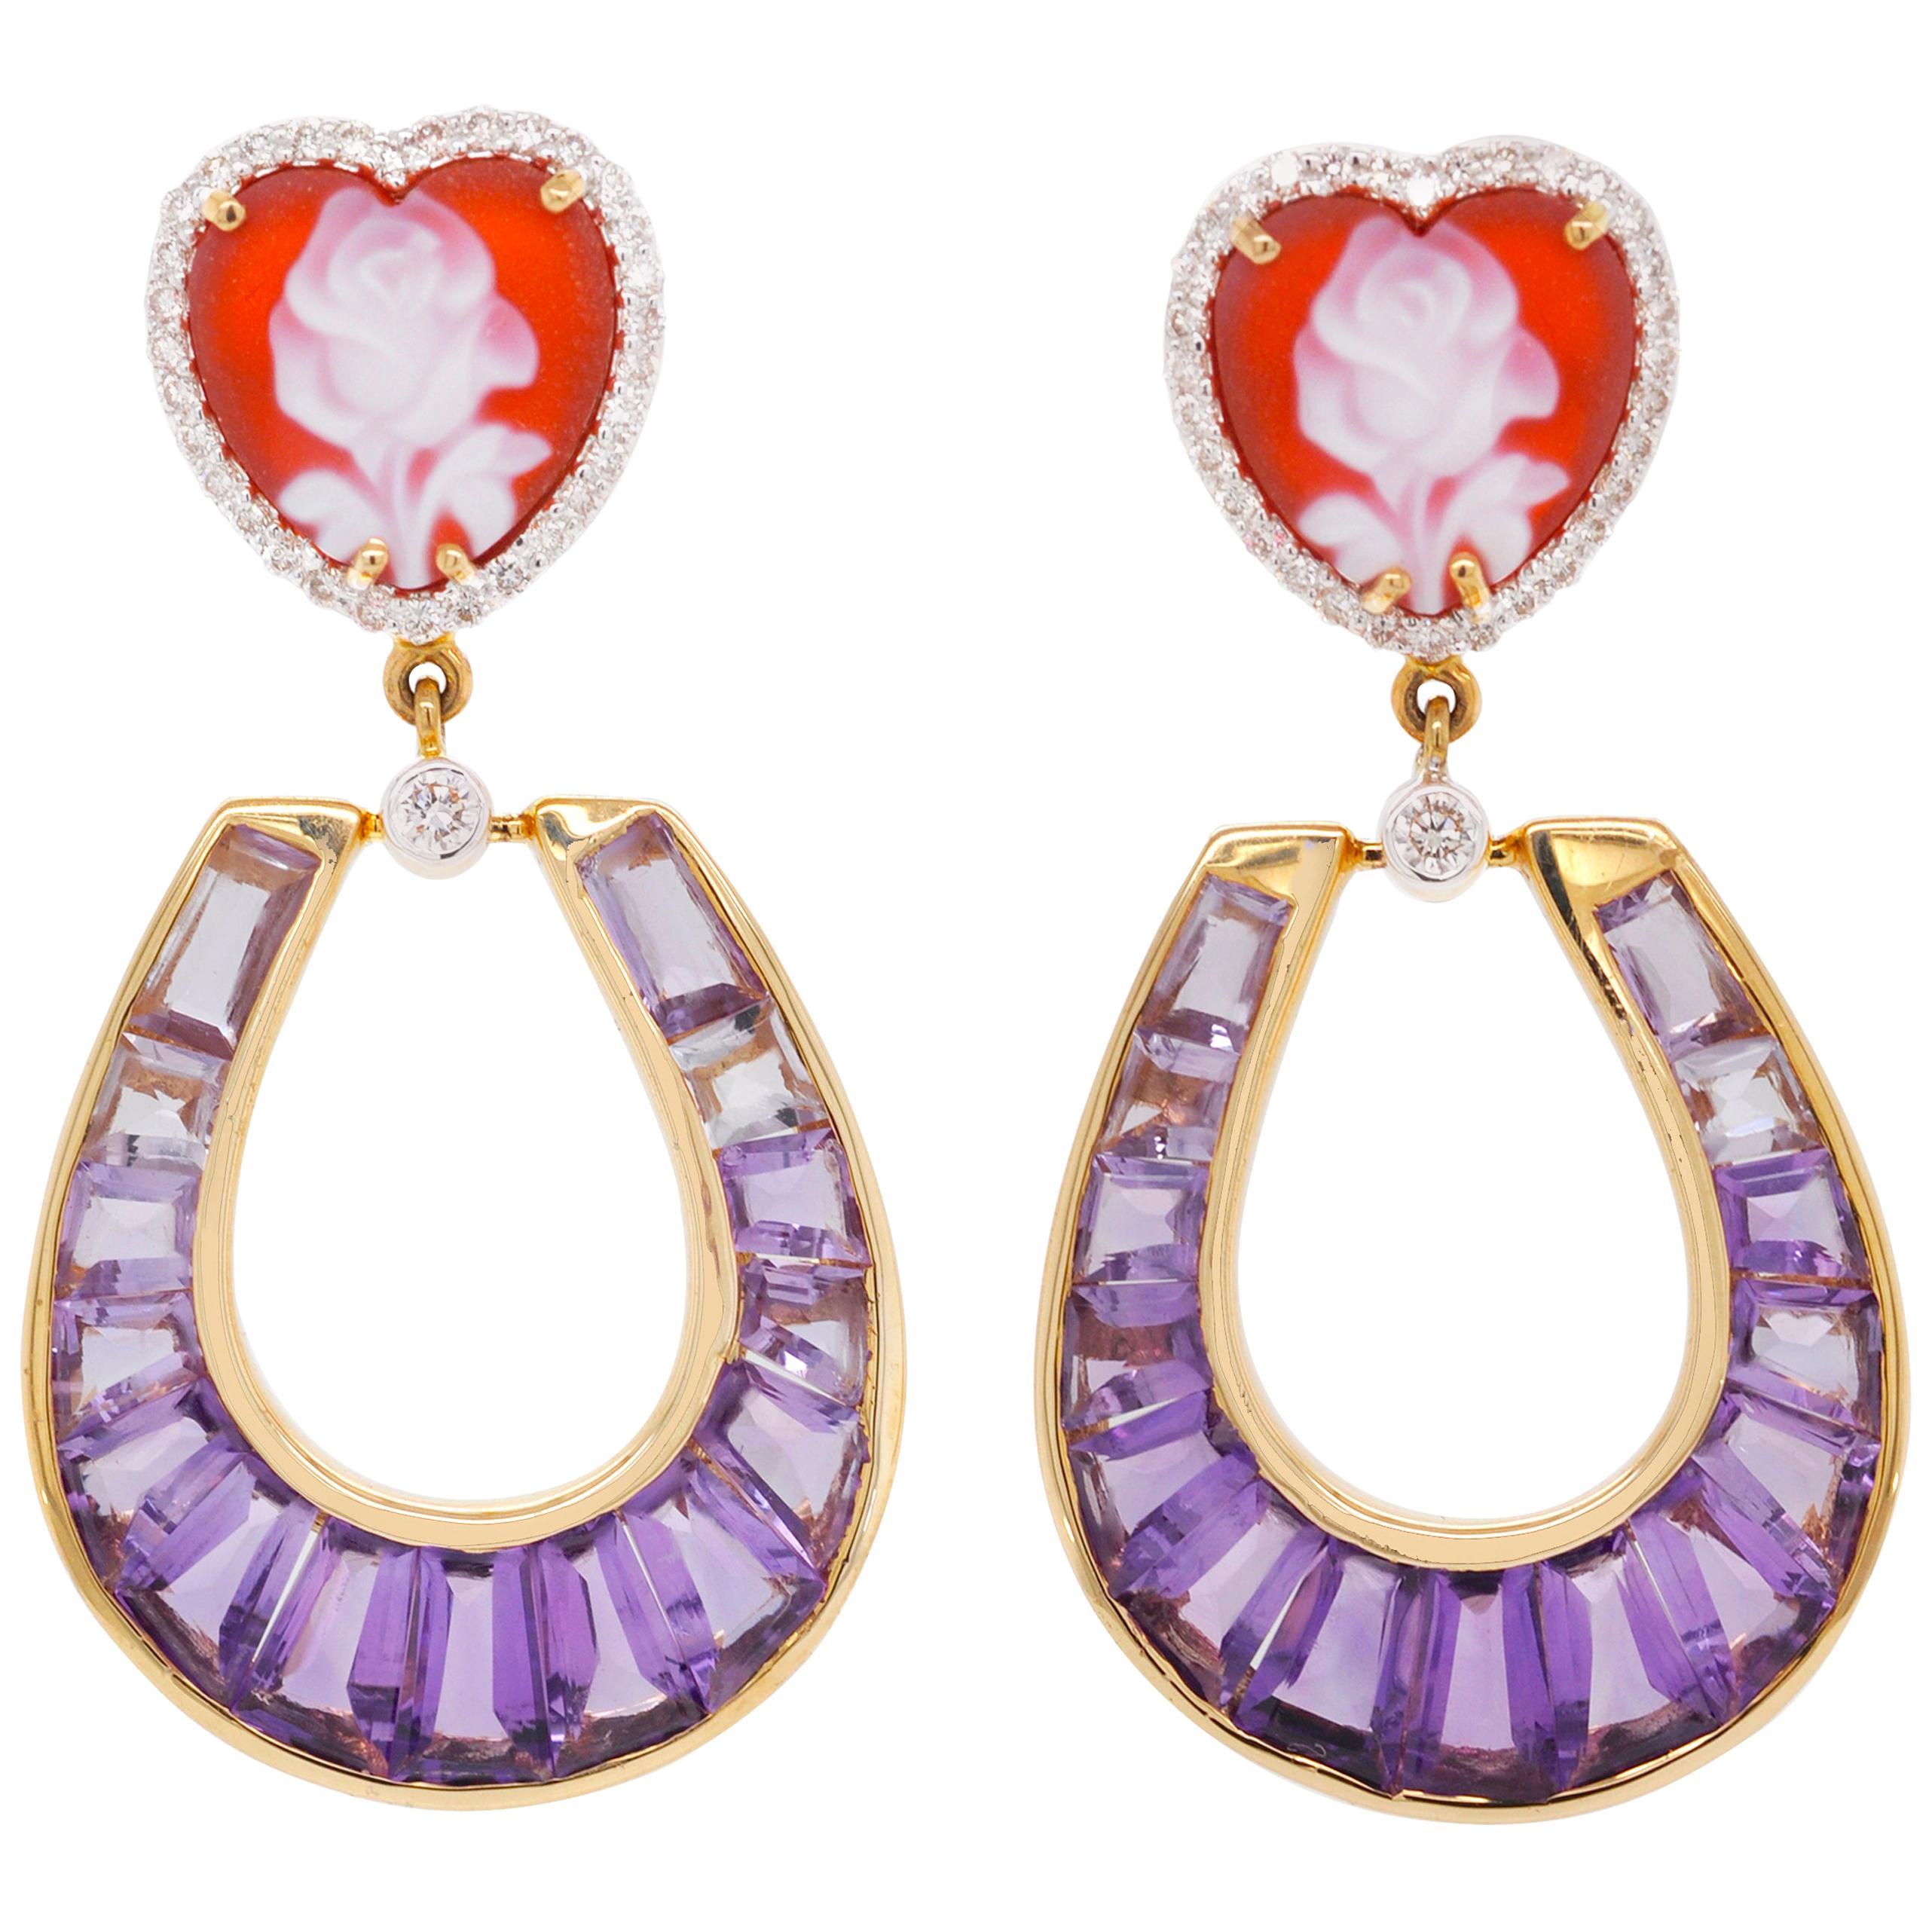 18 Karat Gold Amethyst Baguette Heart Cameo Diamond Dangling Drop Earrings